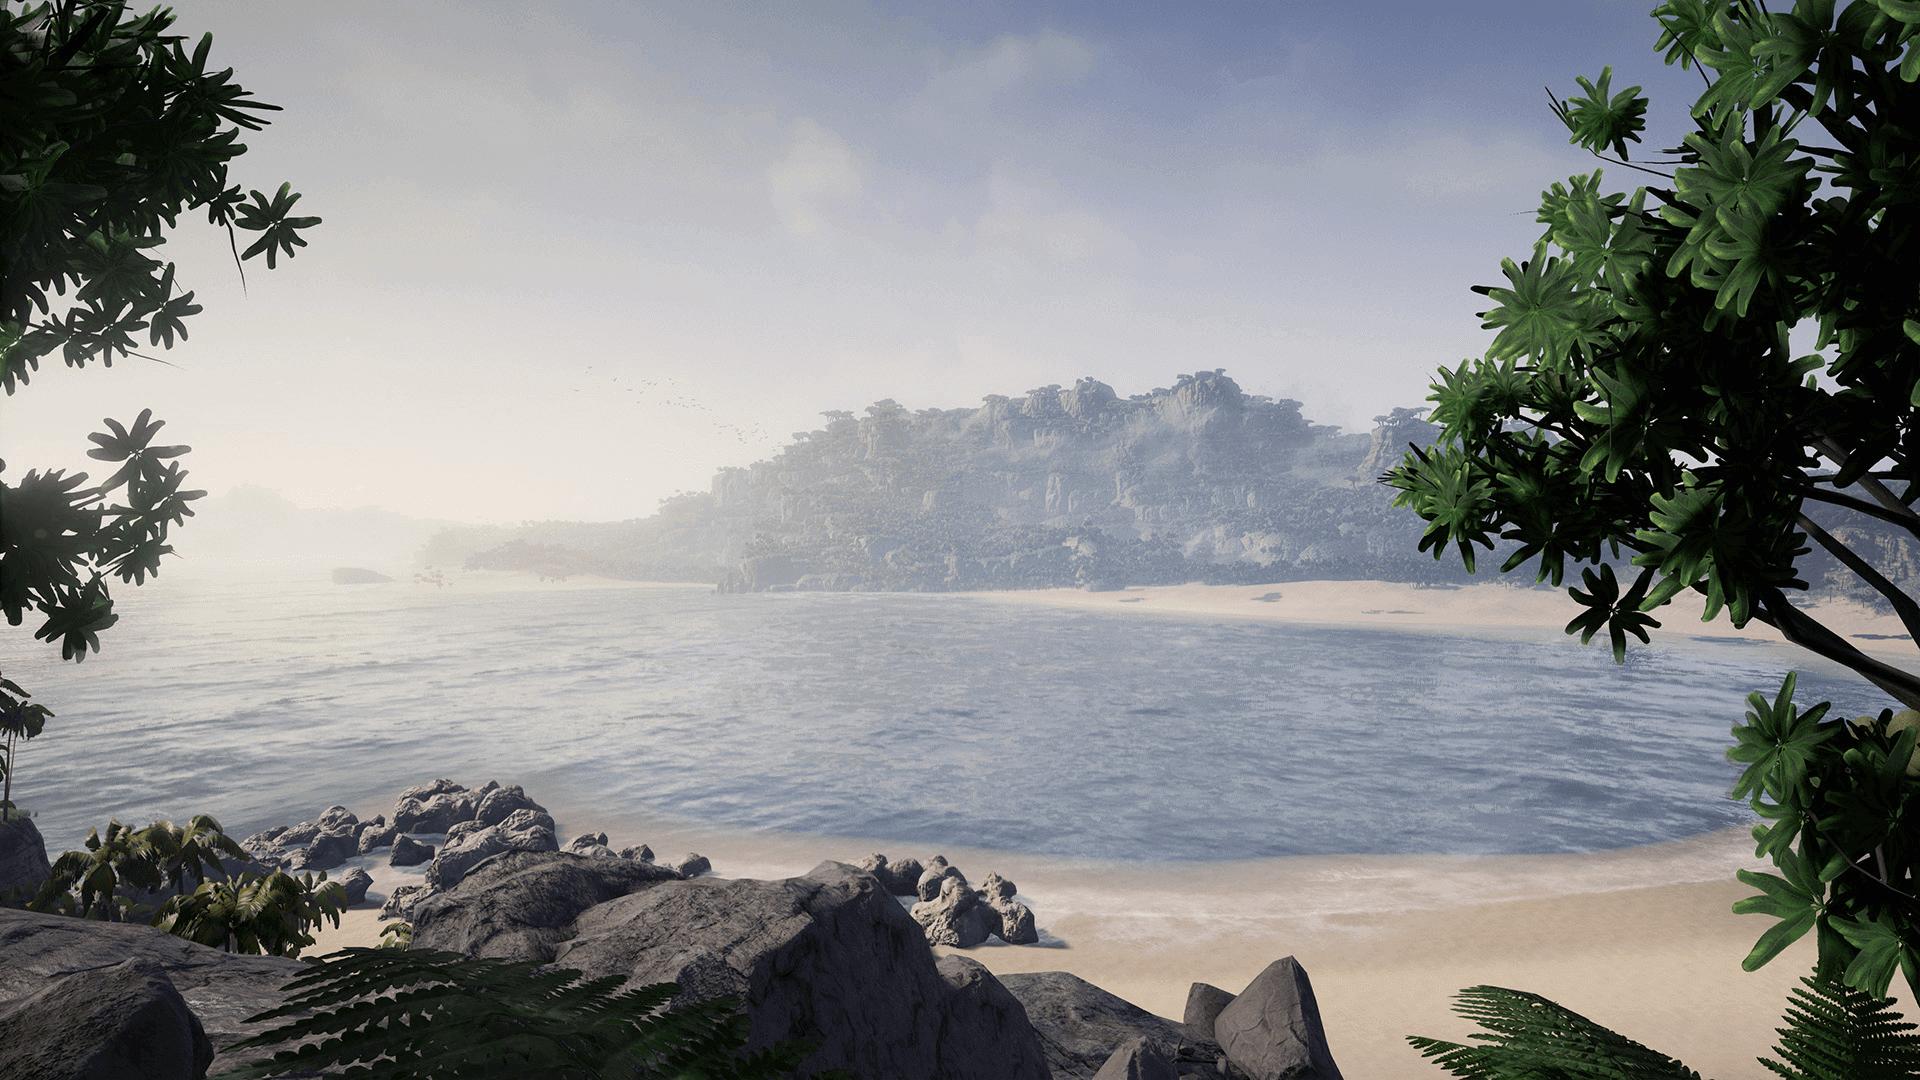 TropicalIsland Screenshot 05 1920x1080 e794a307fb1c872bbdf64d2f58d5acb6 - Tropical Island Environment - UE4热带岛屿环境资源